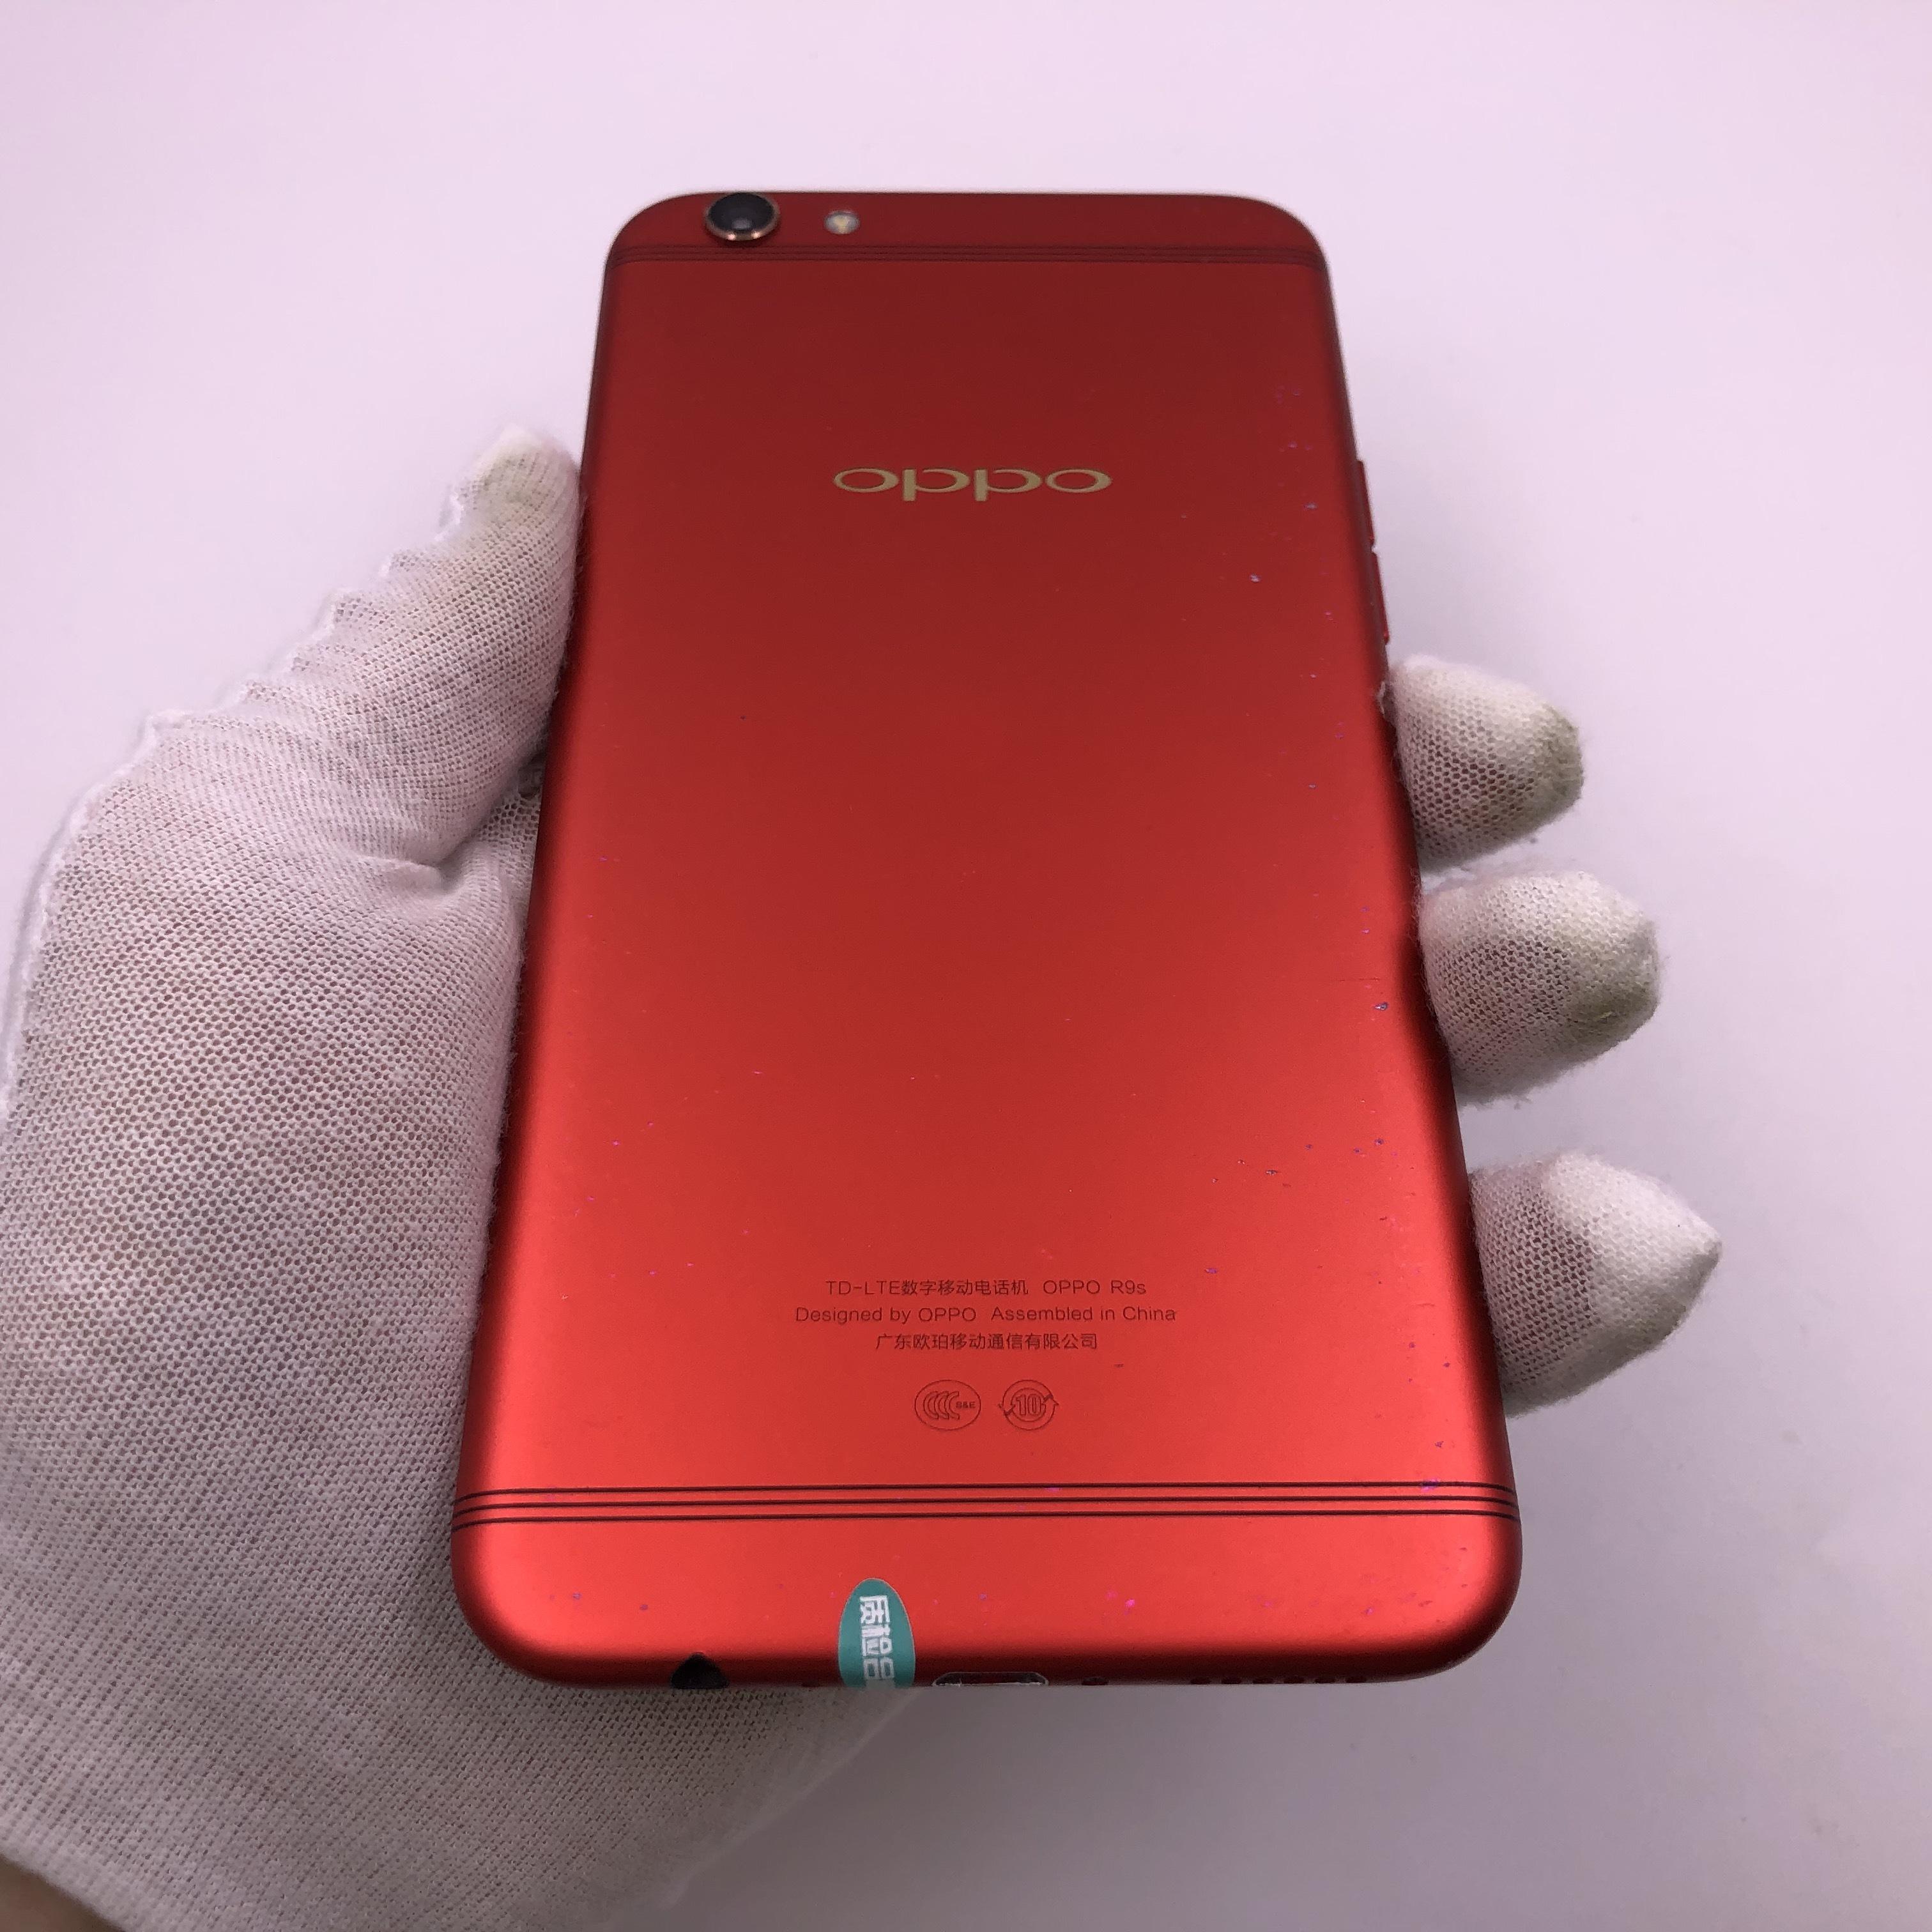 oppo【R9s】4G全网通 红色 64G 国行 9成新